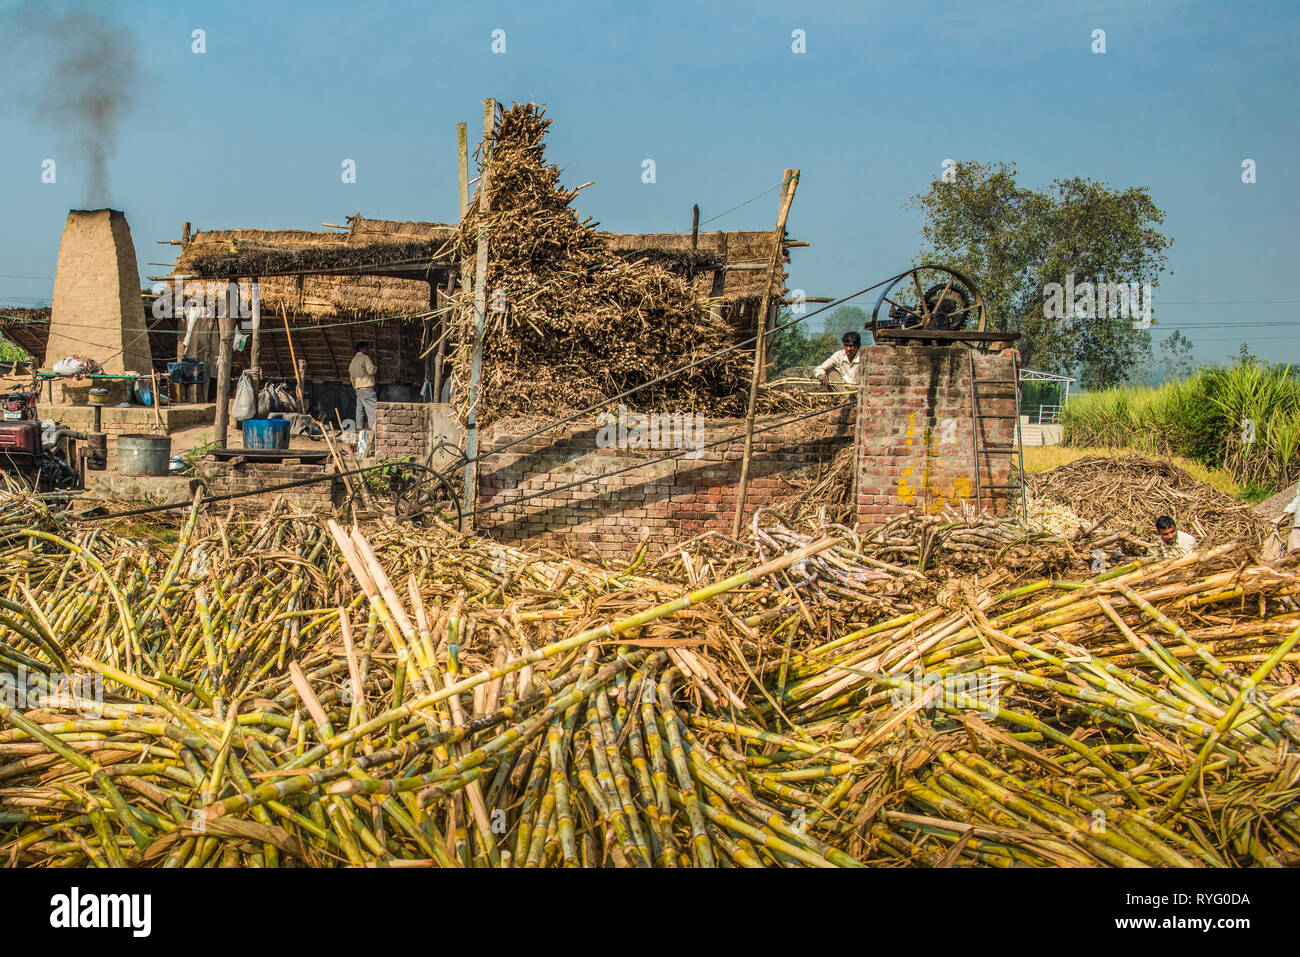 HIMACHAL PRADESH, INDIA.  traditional cane sugar plant in rural India - Stock Image